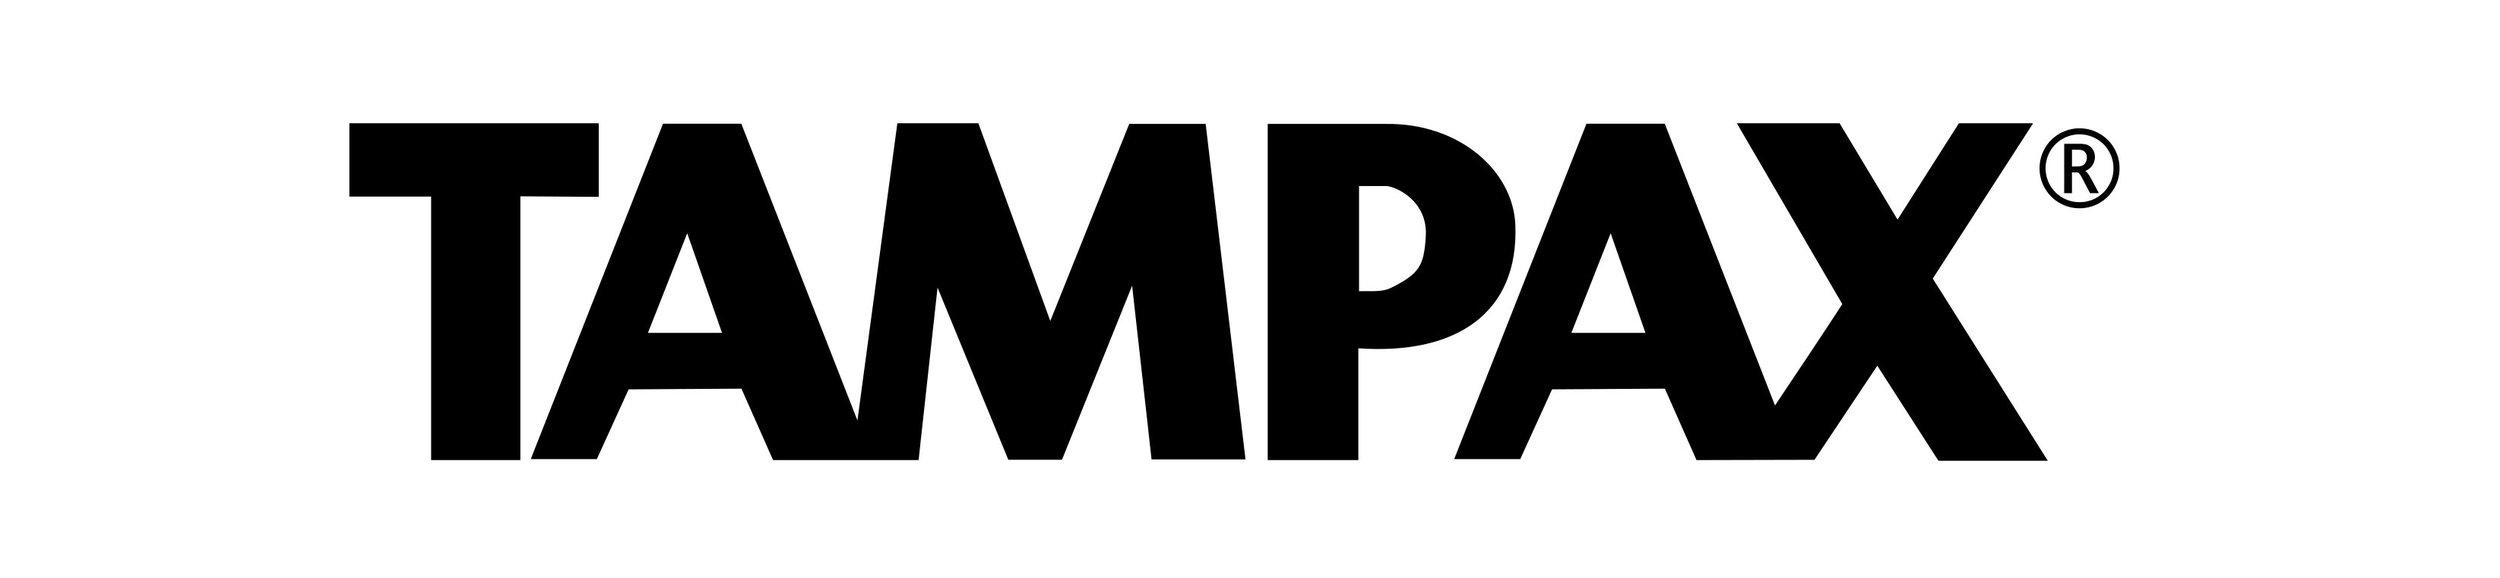 tampax-logo-png-transparent copy.jpg